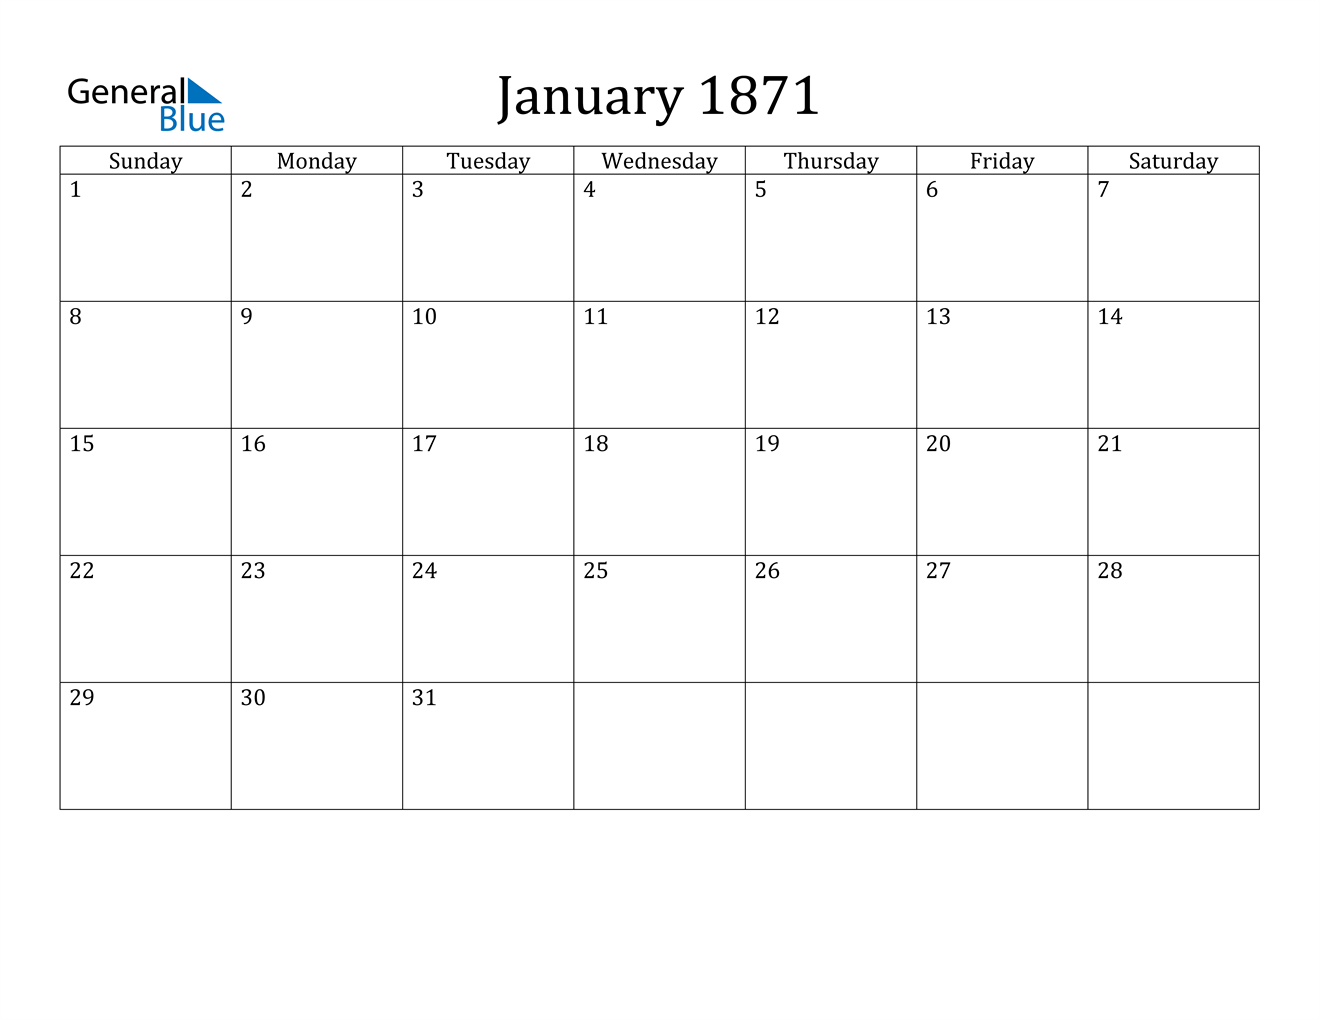 Image of January 1871 Calendar